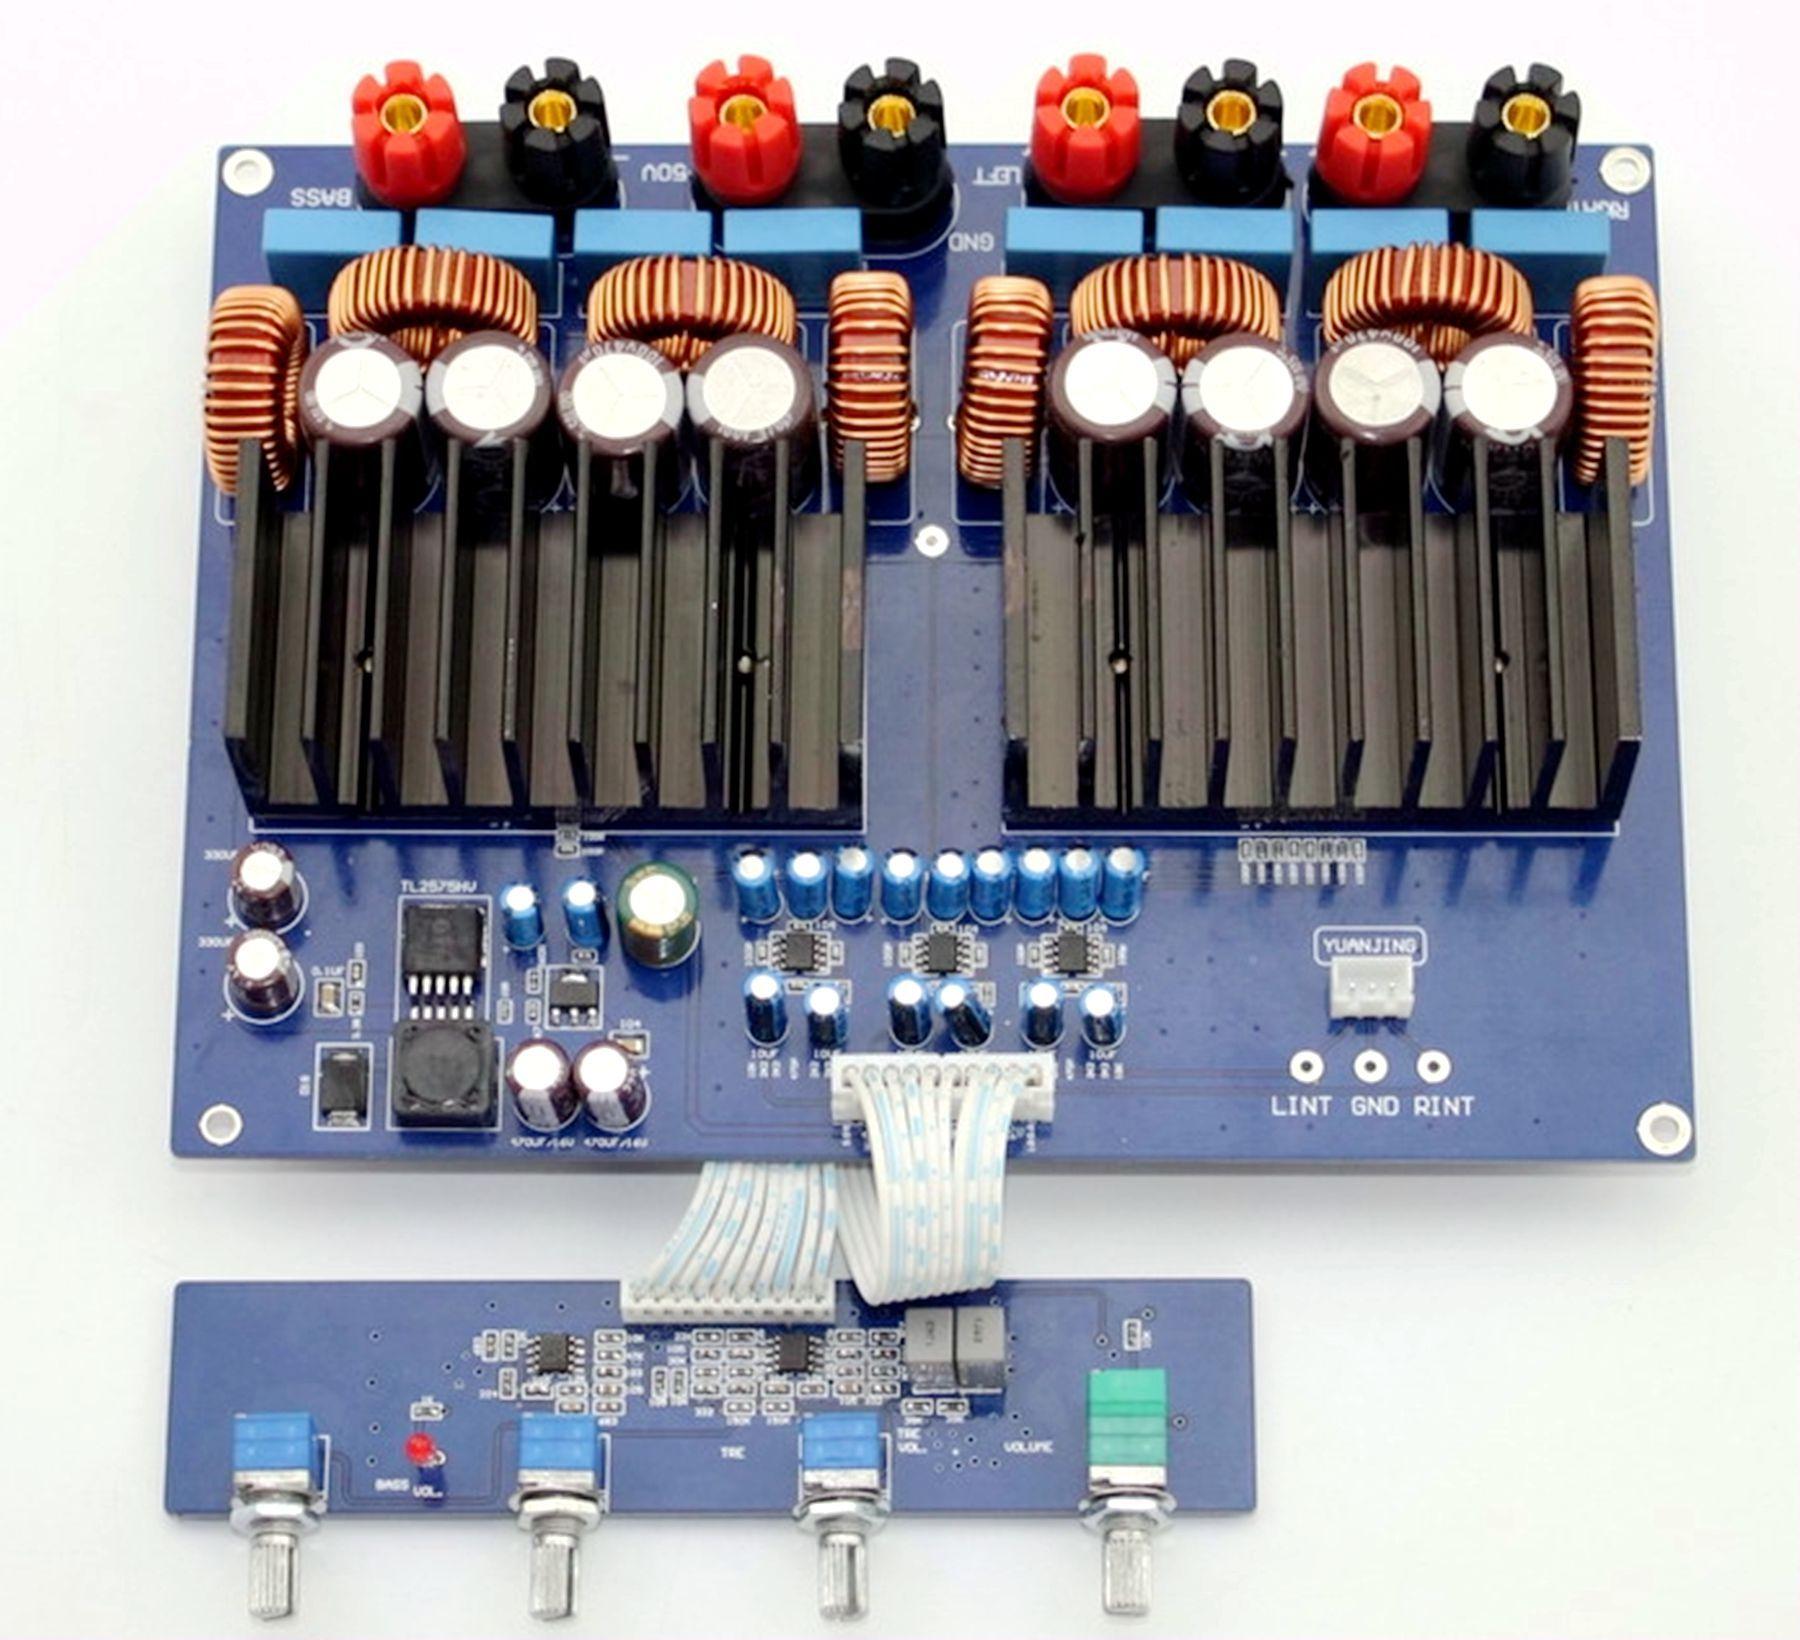 Online Cheap Tas5630 21 High Power Amplifier Board 1200w By 300w Diy Circuit Wonderful Land